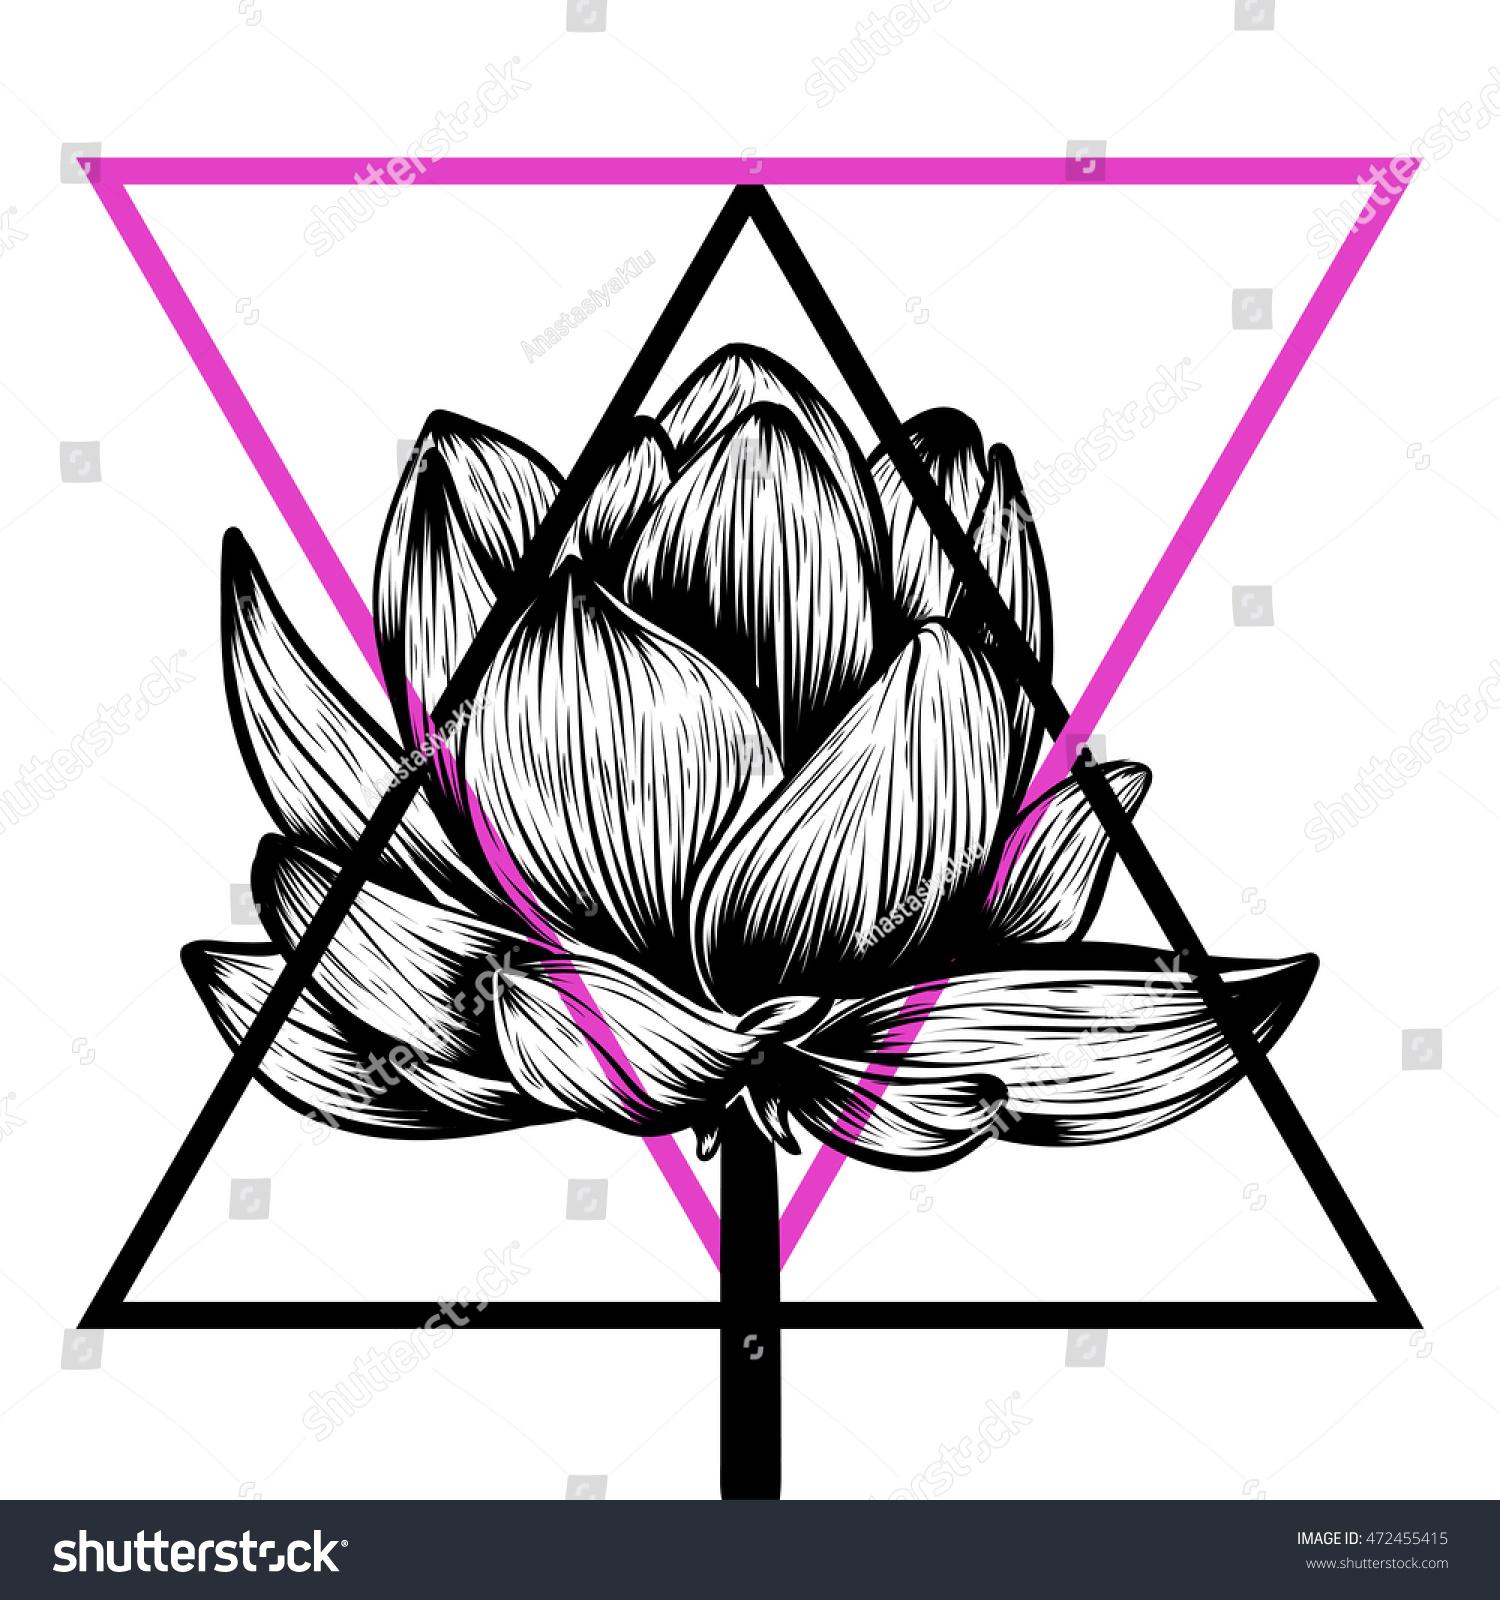 Hand drawn lotus flower tshirt tattoo stock photo photo vector hand drawn lotus flower t shirt tattoo design element bouquet concept art izmirmasajfo Images